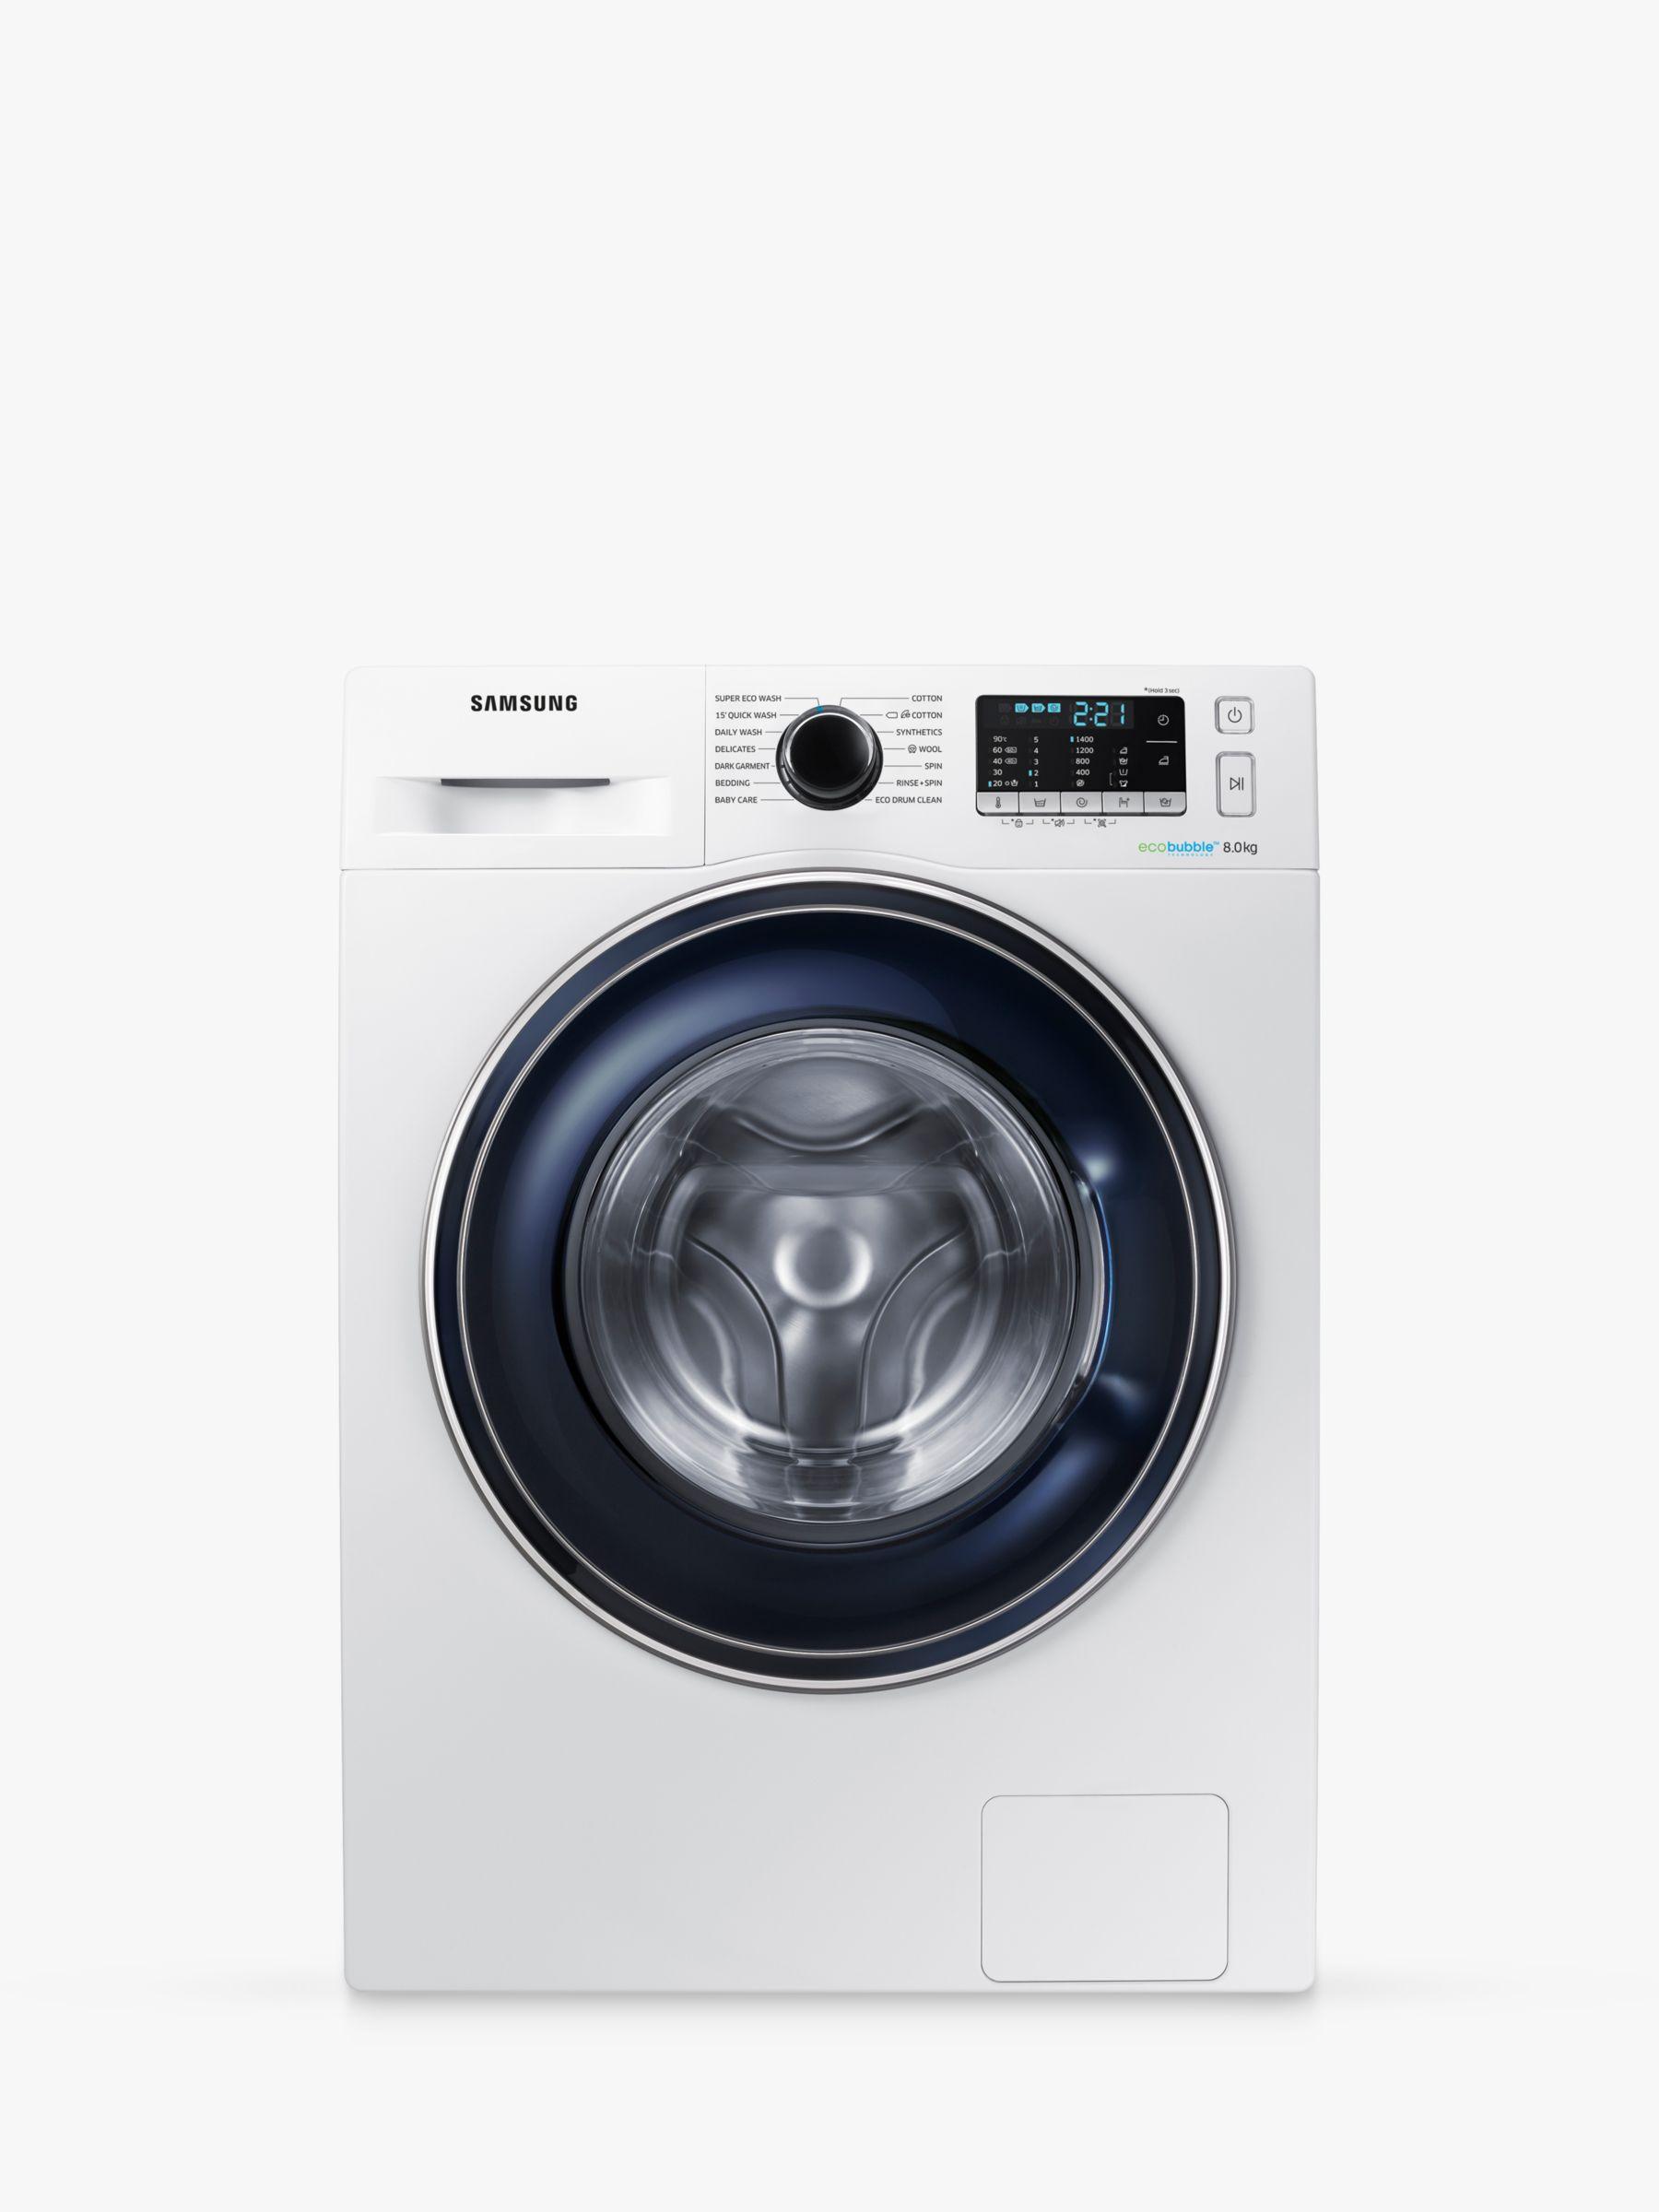 Choosing the right washing machine